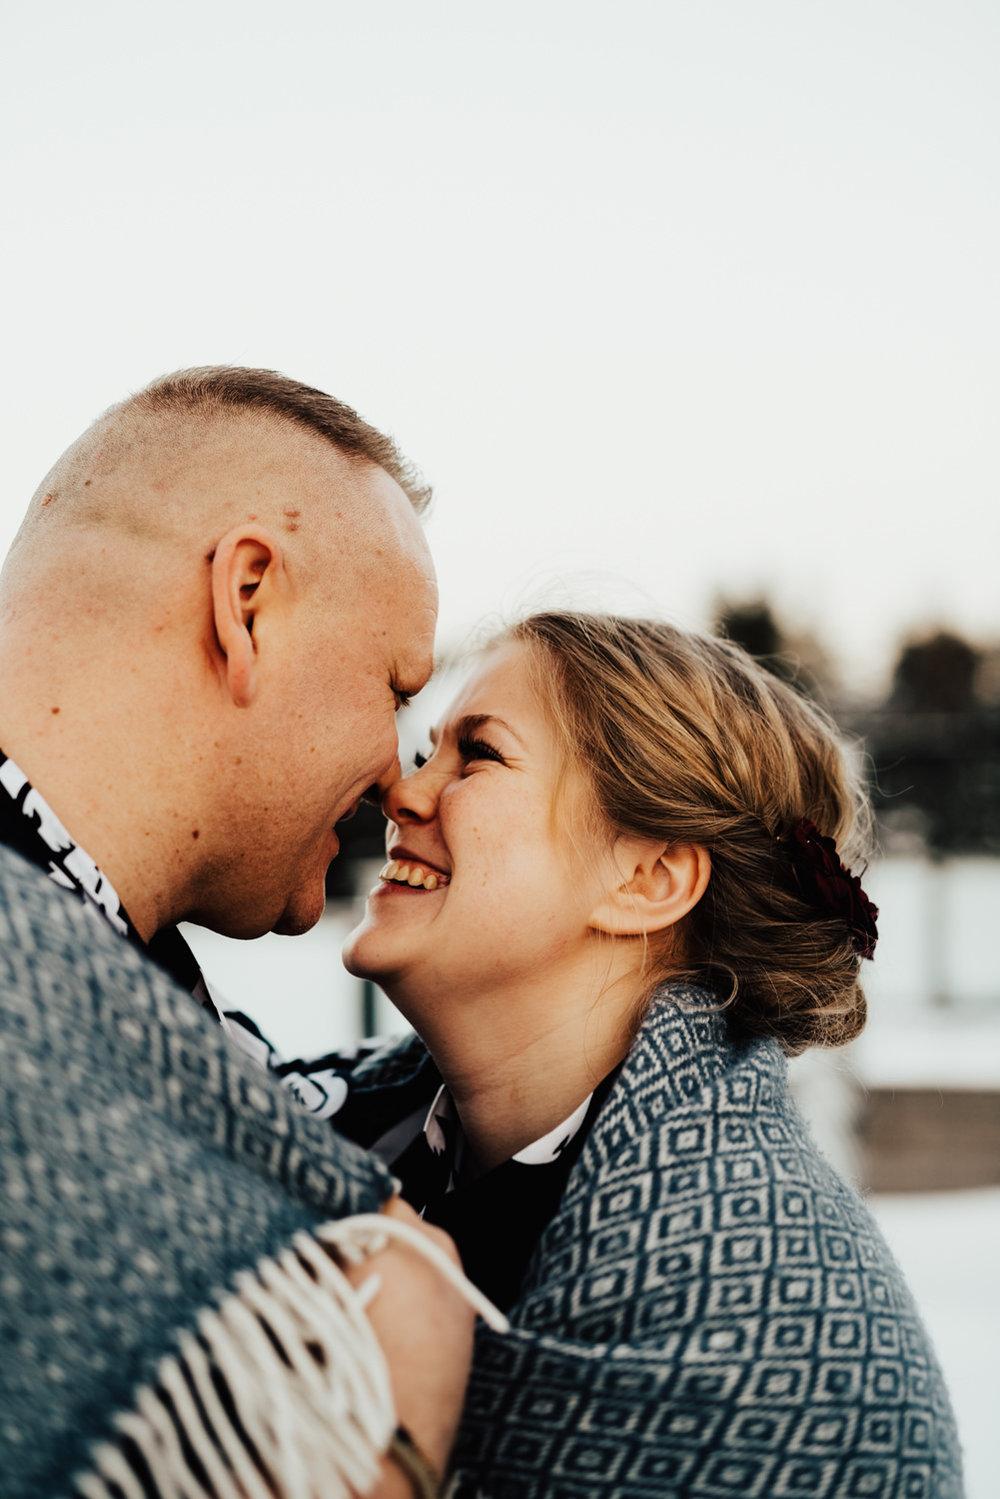 Linnsejphotography-fotograf-brollopsfotograf-brollop-stockholm-yasuragi-elopement-sweden-hemligt-brollop-borgerlig-vinterbrollop-vinter-brollopsinspiration--0035.jpg